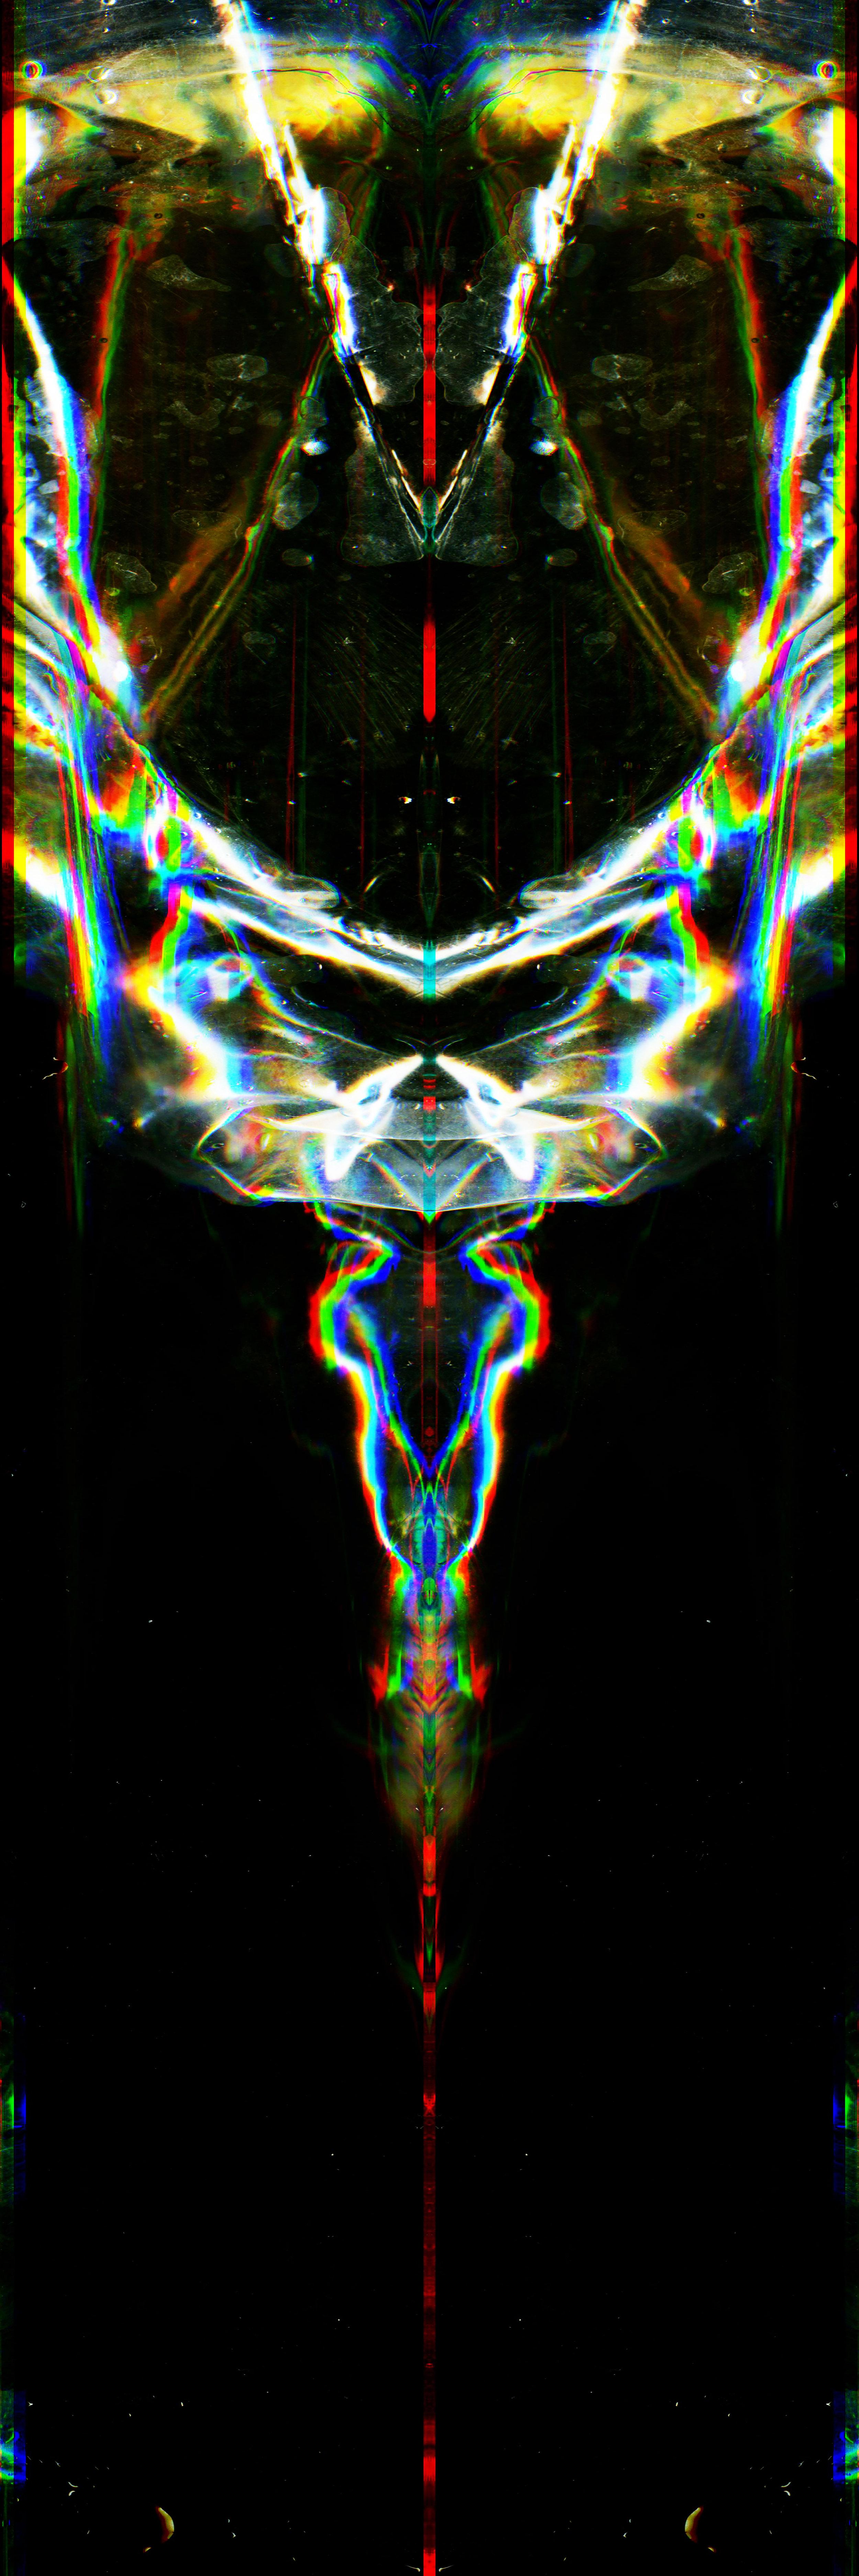 abstract-f-printready.jpg